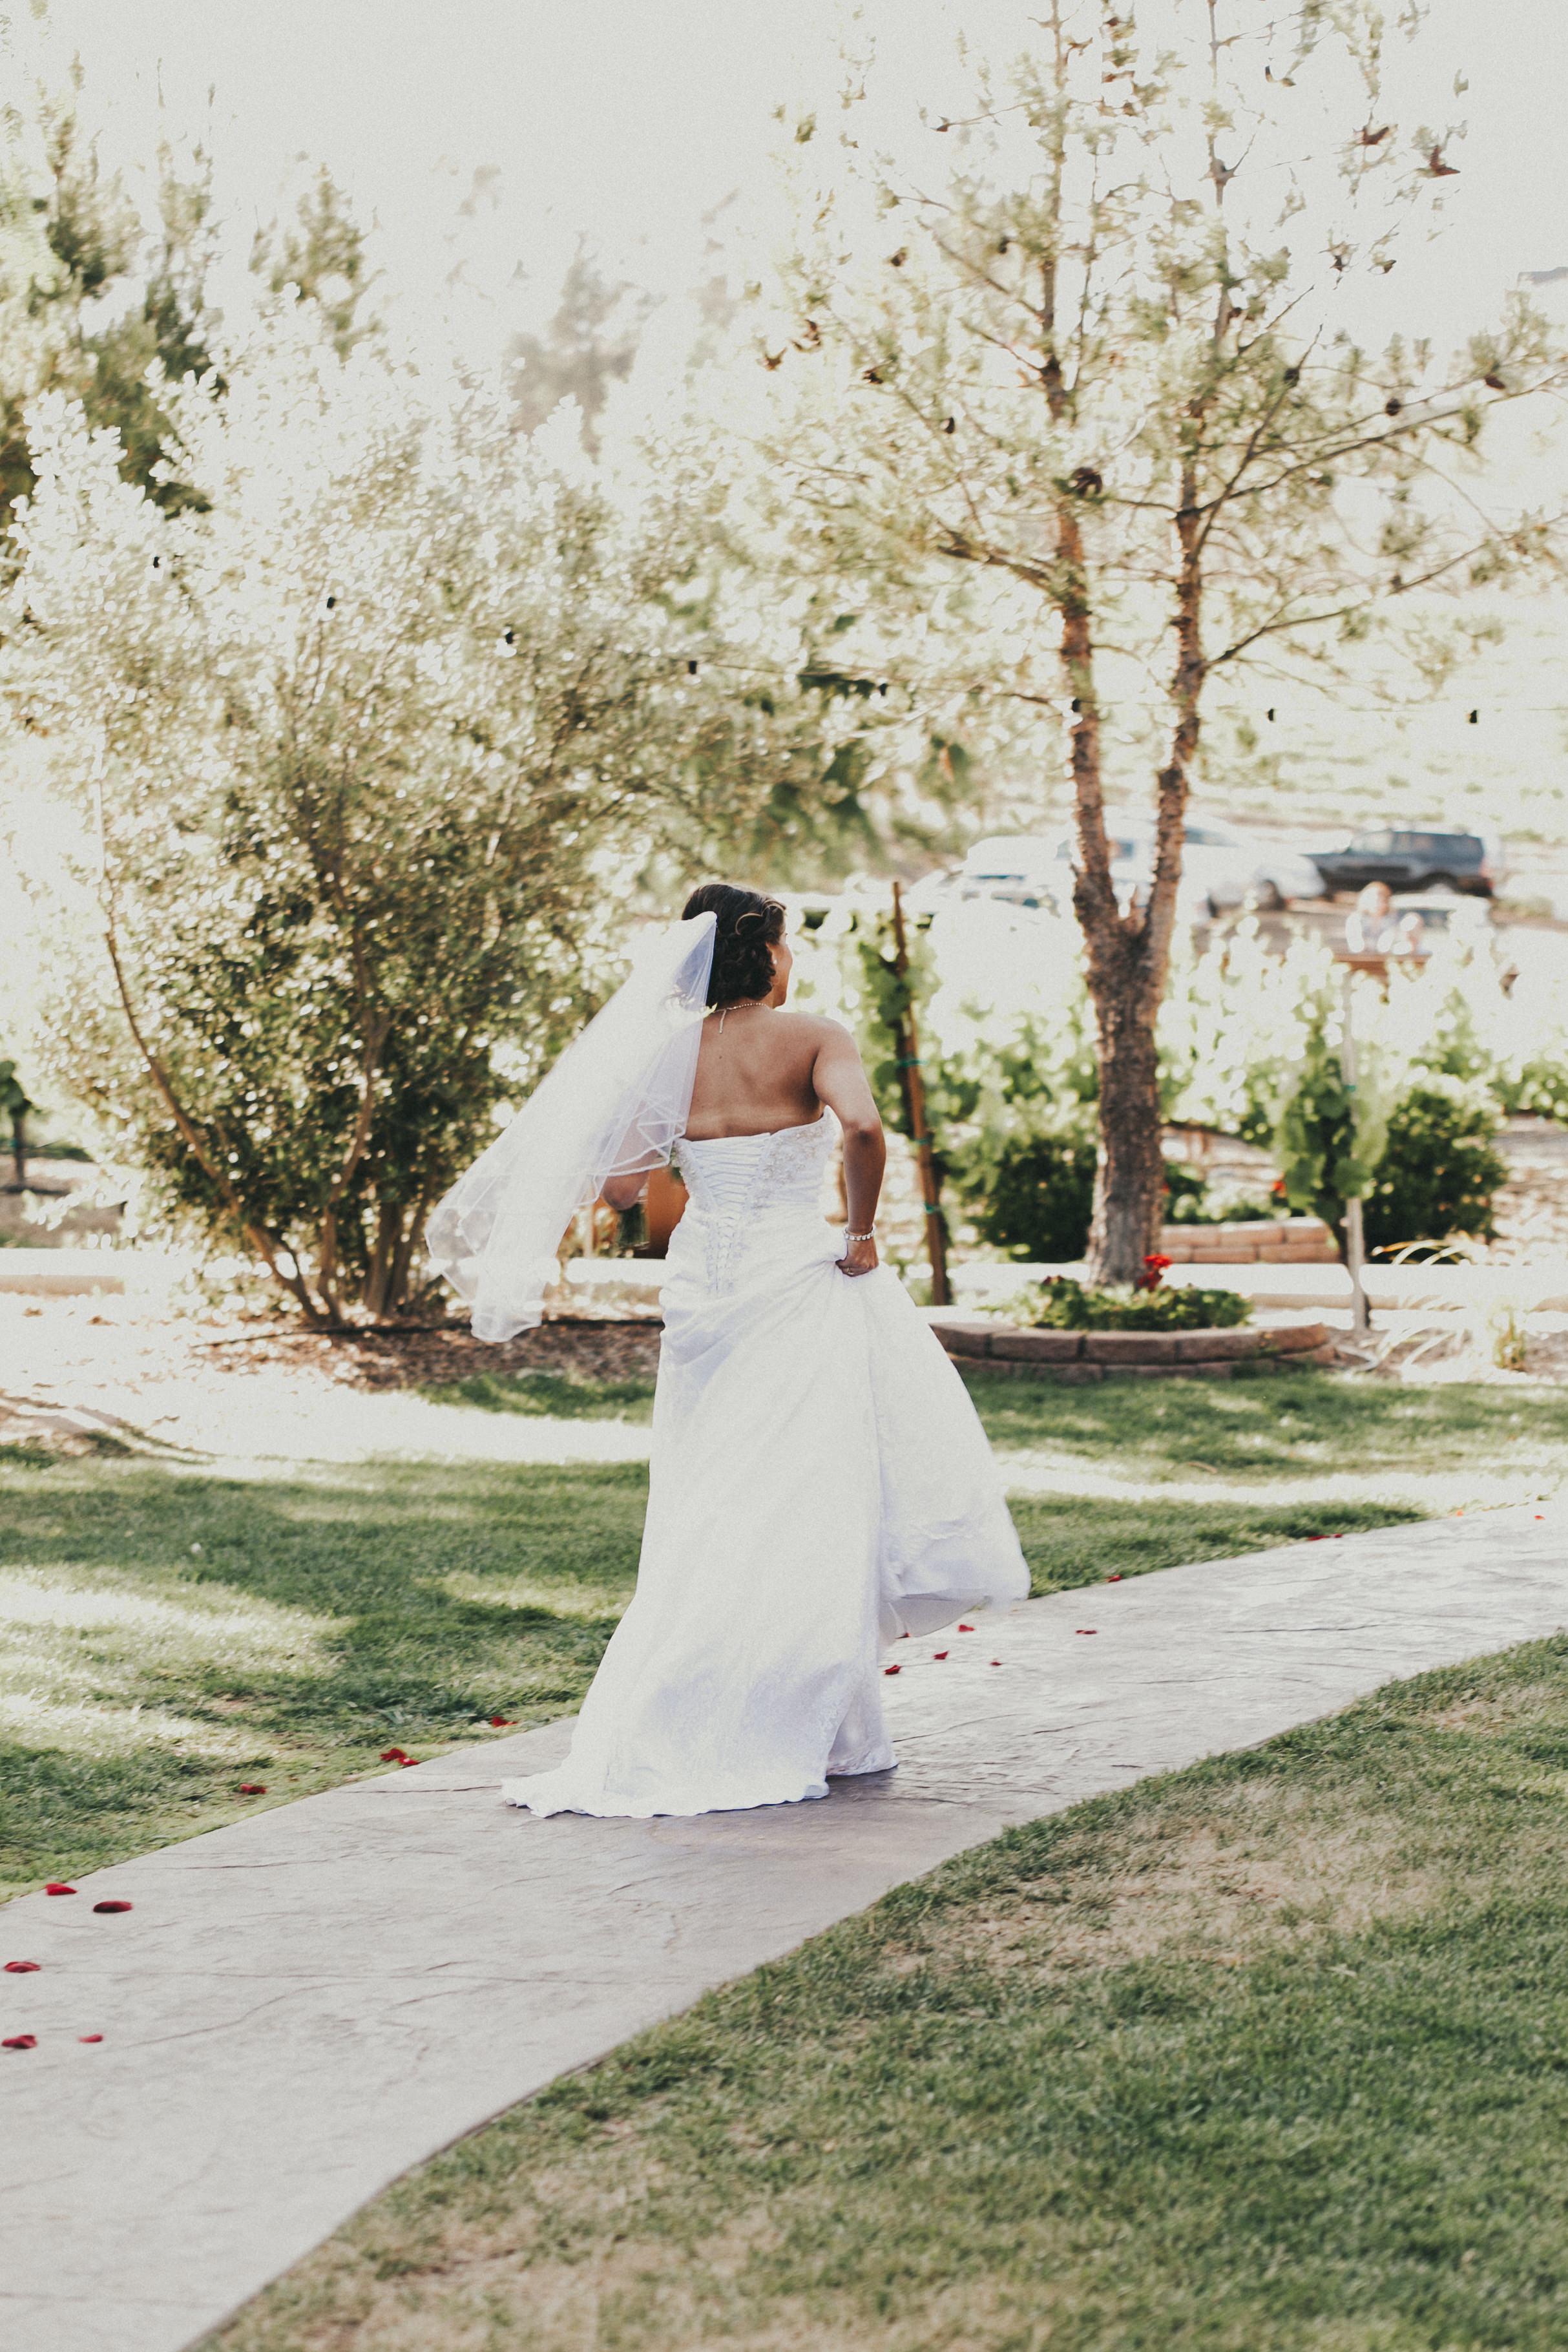 Cheyenne + Jordan - Wedding, Natalie Griffo (48 of 157).jpg